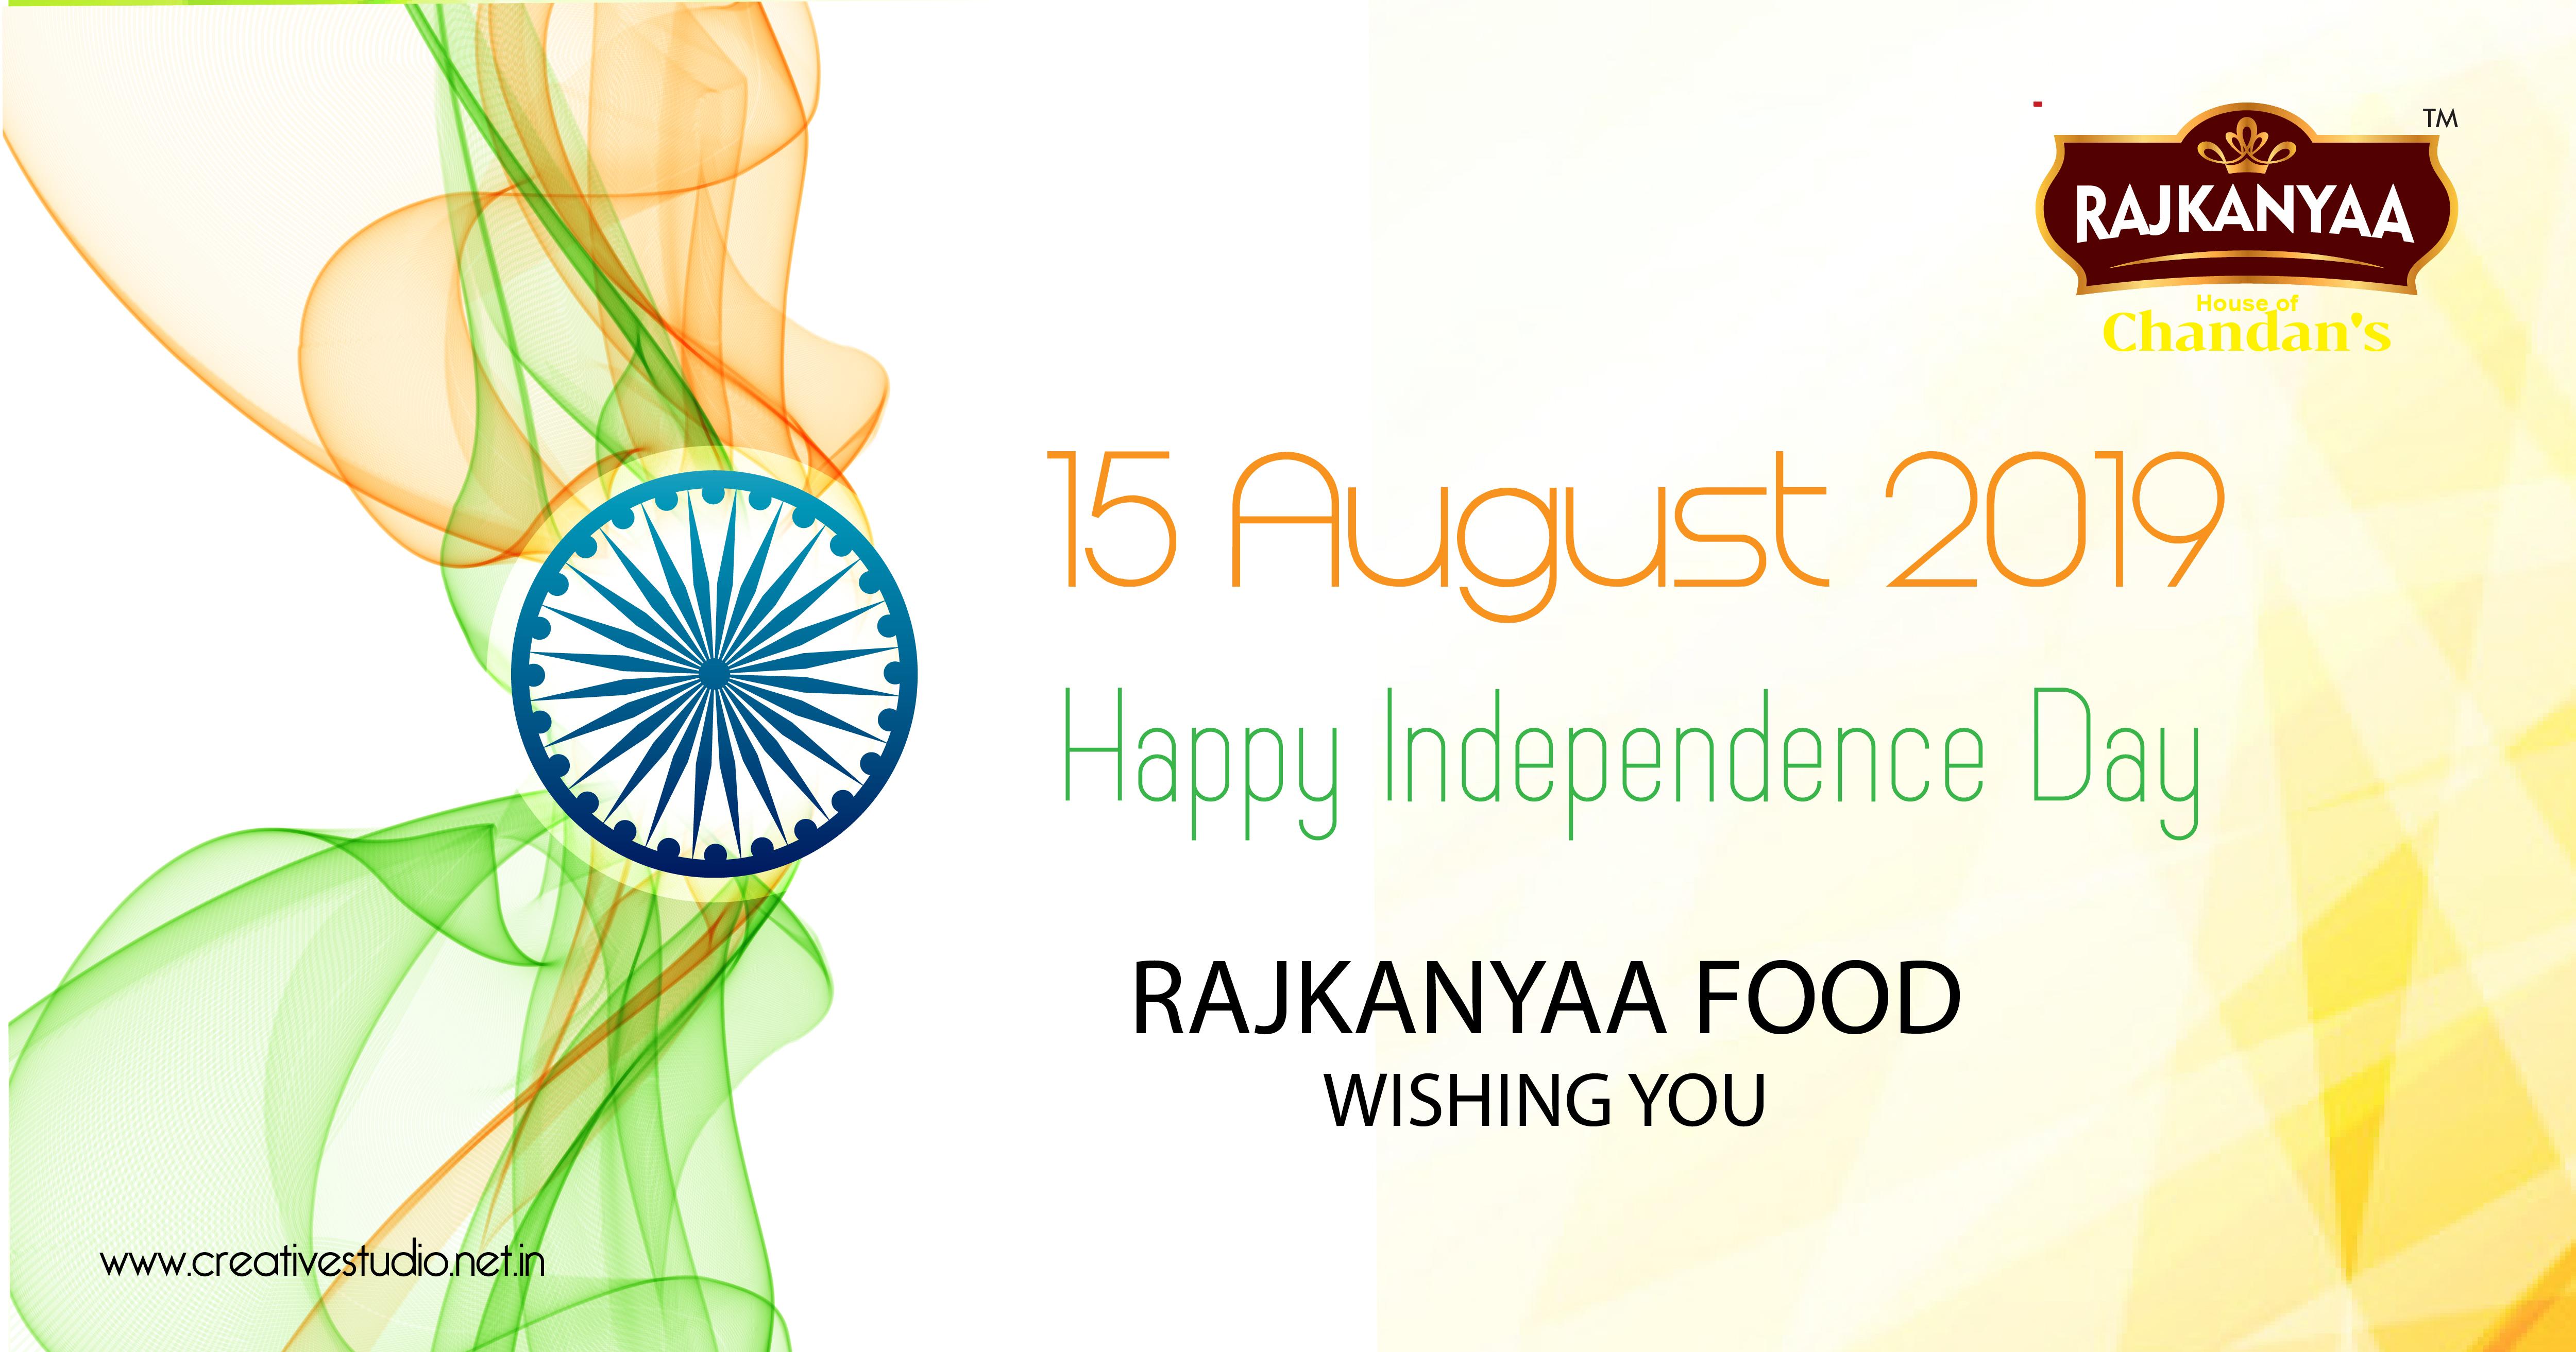 1 RAJKANYAA FOOD Independec day celebration 01 - Social Media Creatives